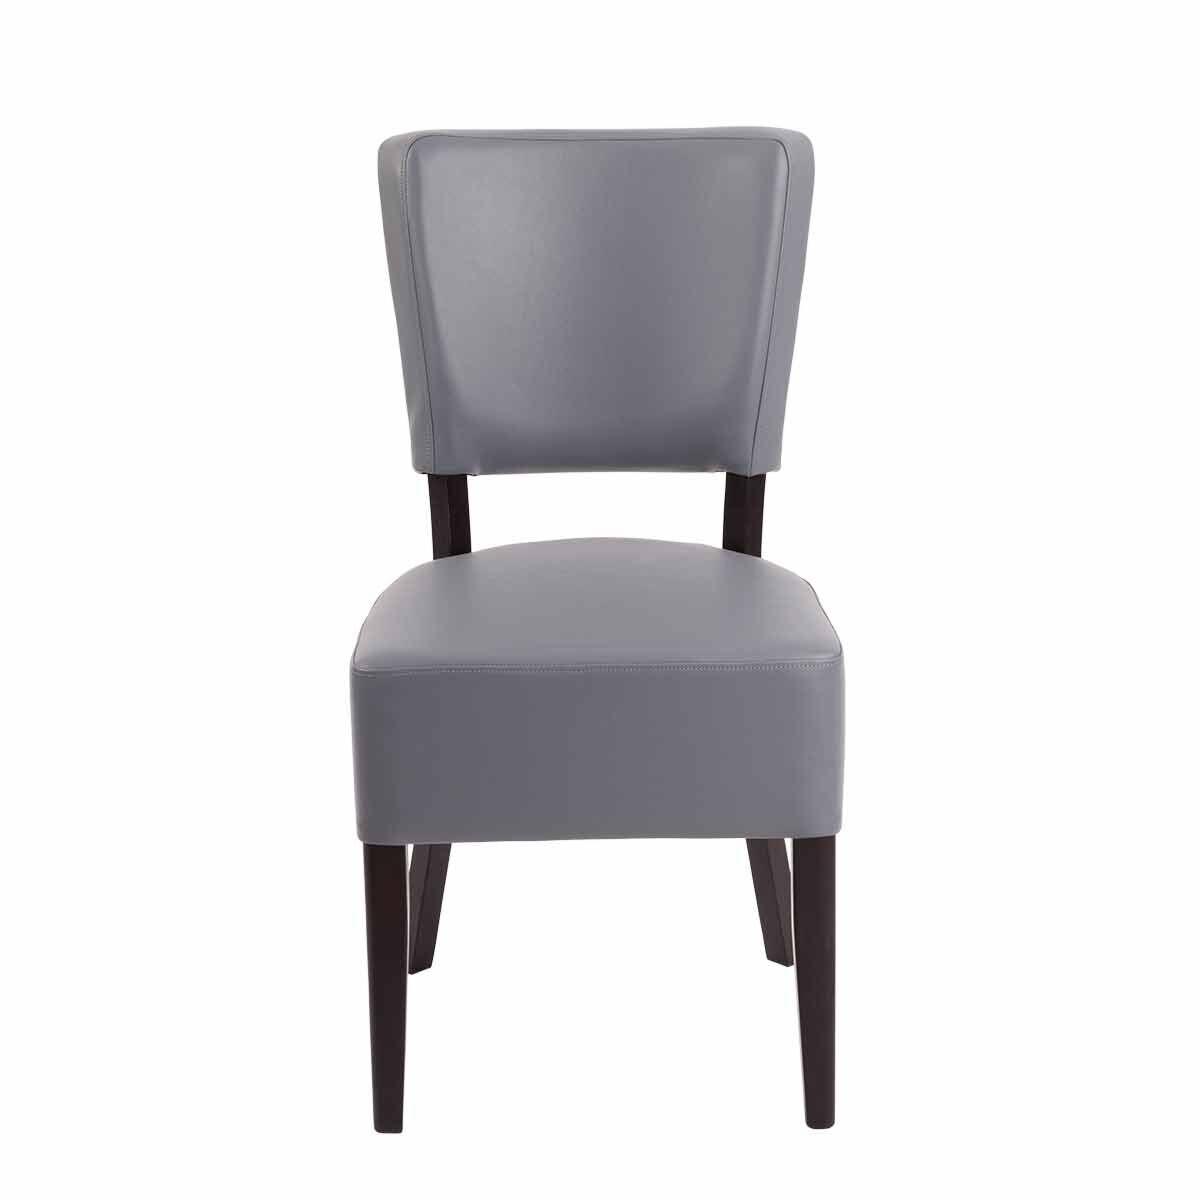 Tabilo Sena Faux Leather Dining Chair Grey